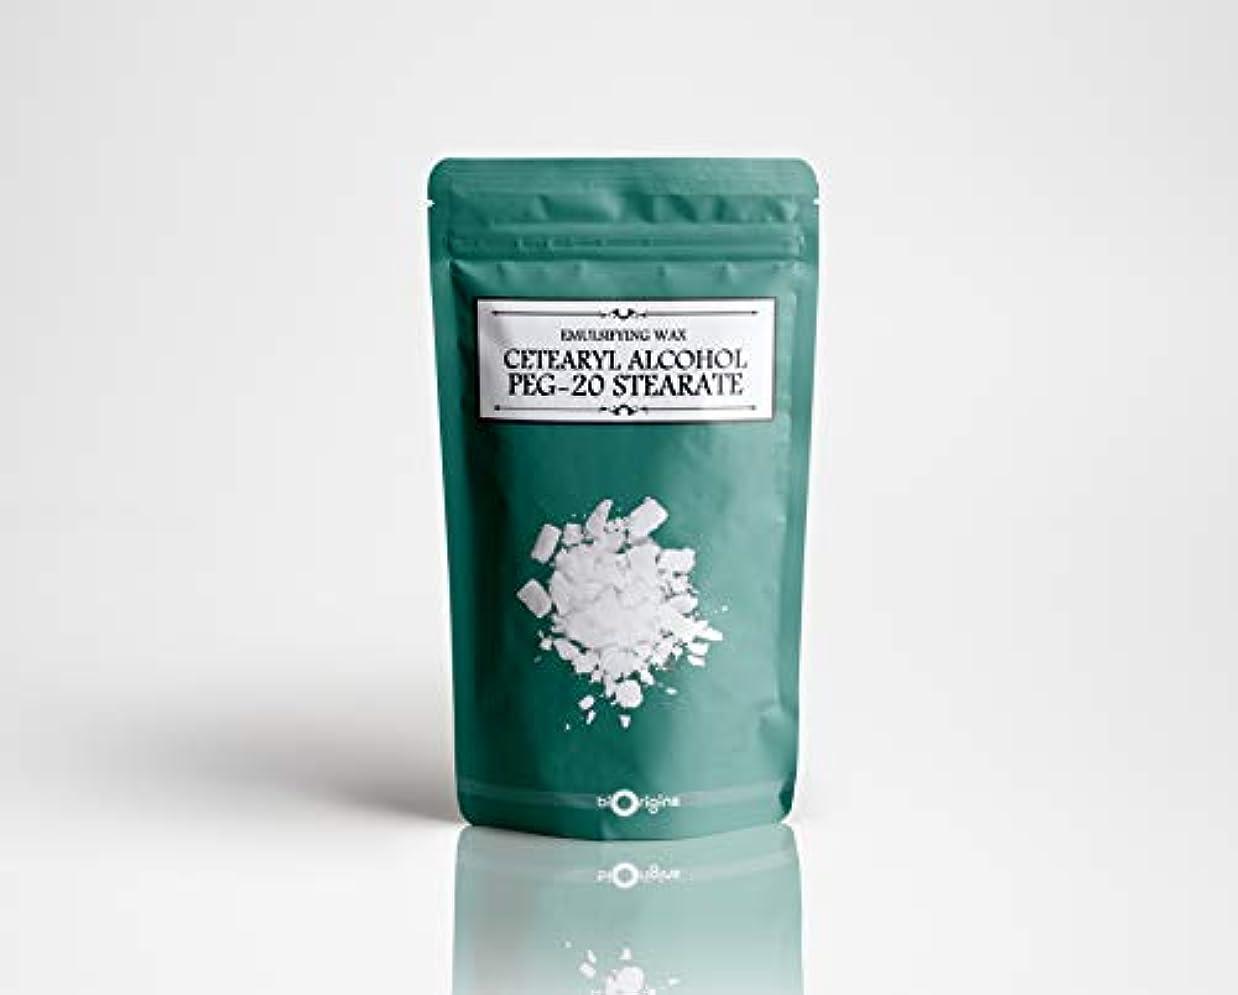 吸収薬用火山学者Emulsifying Wax (Cetearyl Alcohol/PEG-20 Stearate) 100g